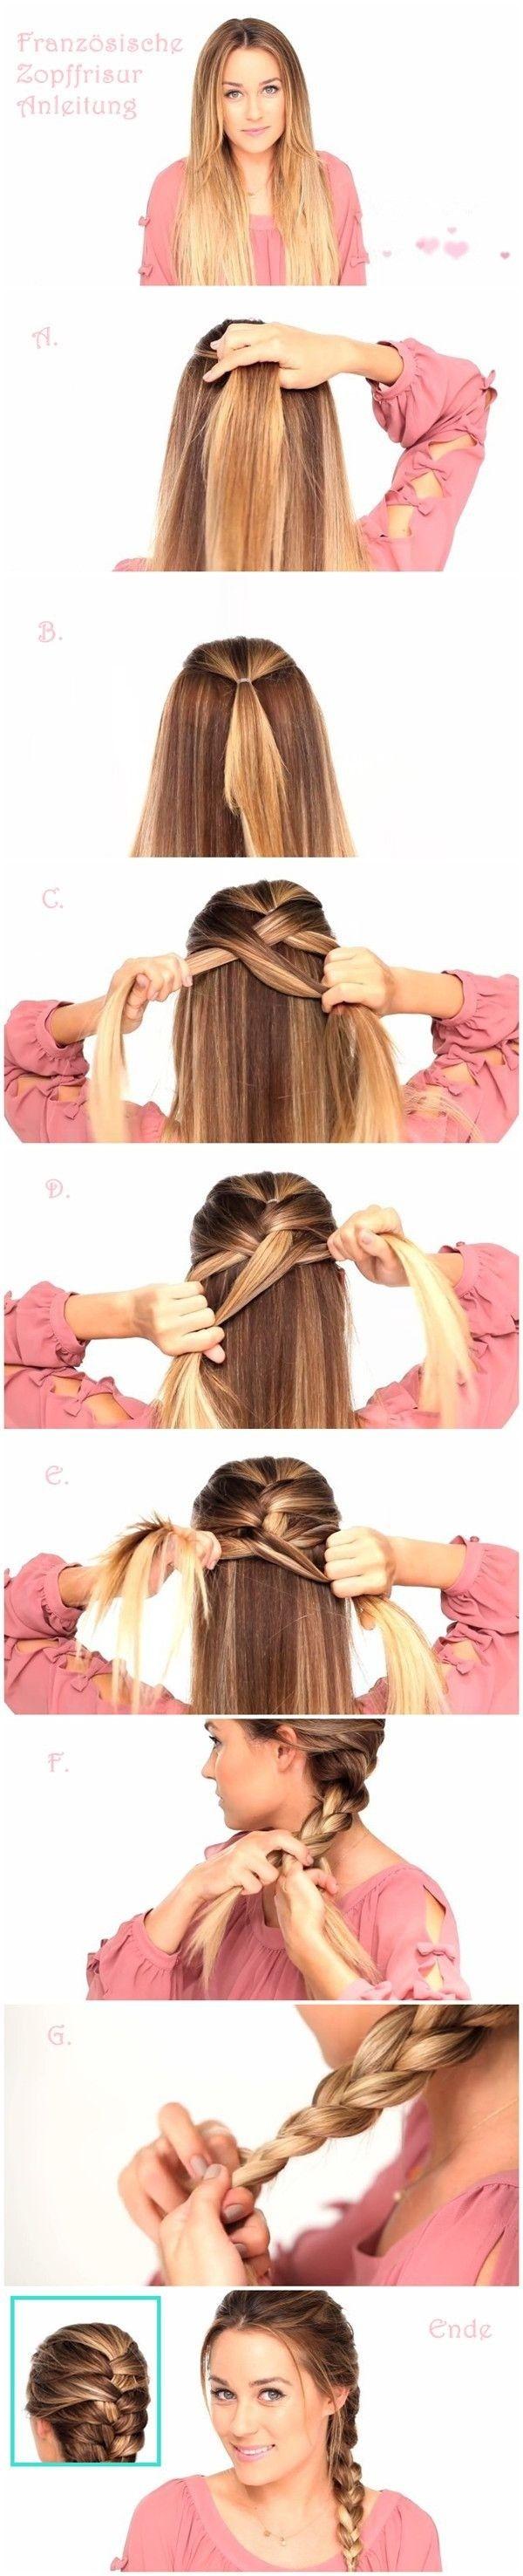 Fabulous 50 Most Beautiful Hairstyles All Women Will Love Styles Weekly Short Hairstyles Gunalazisus